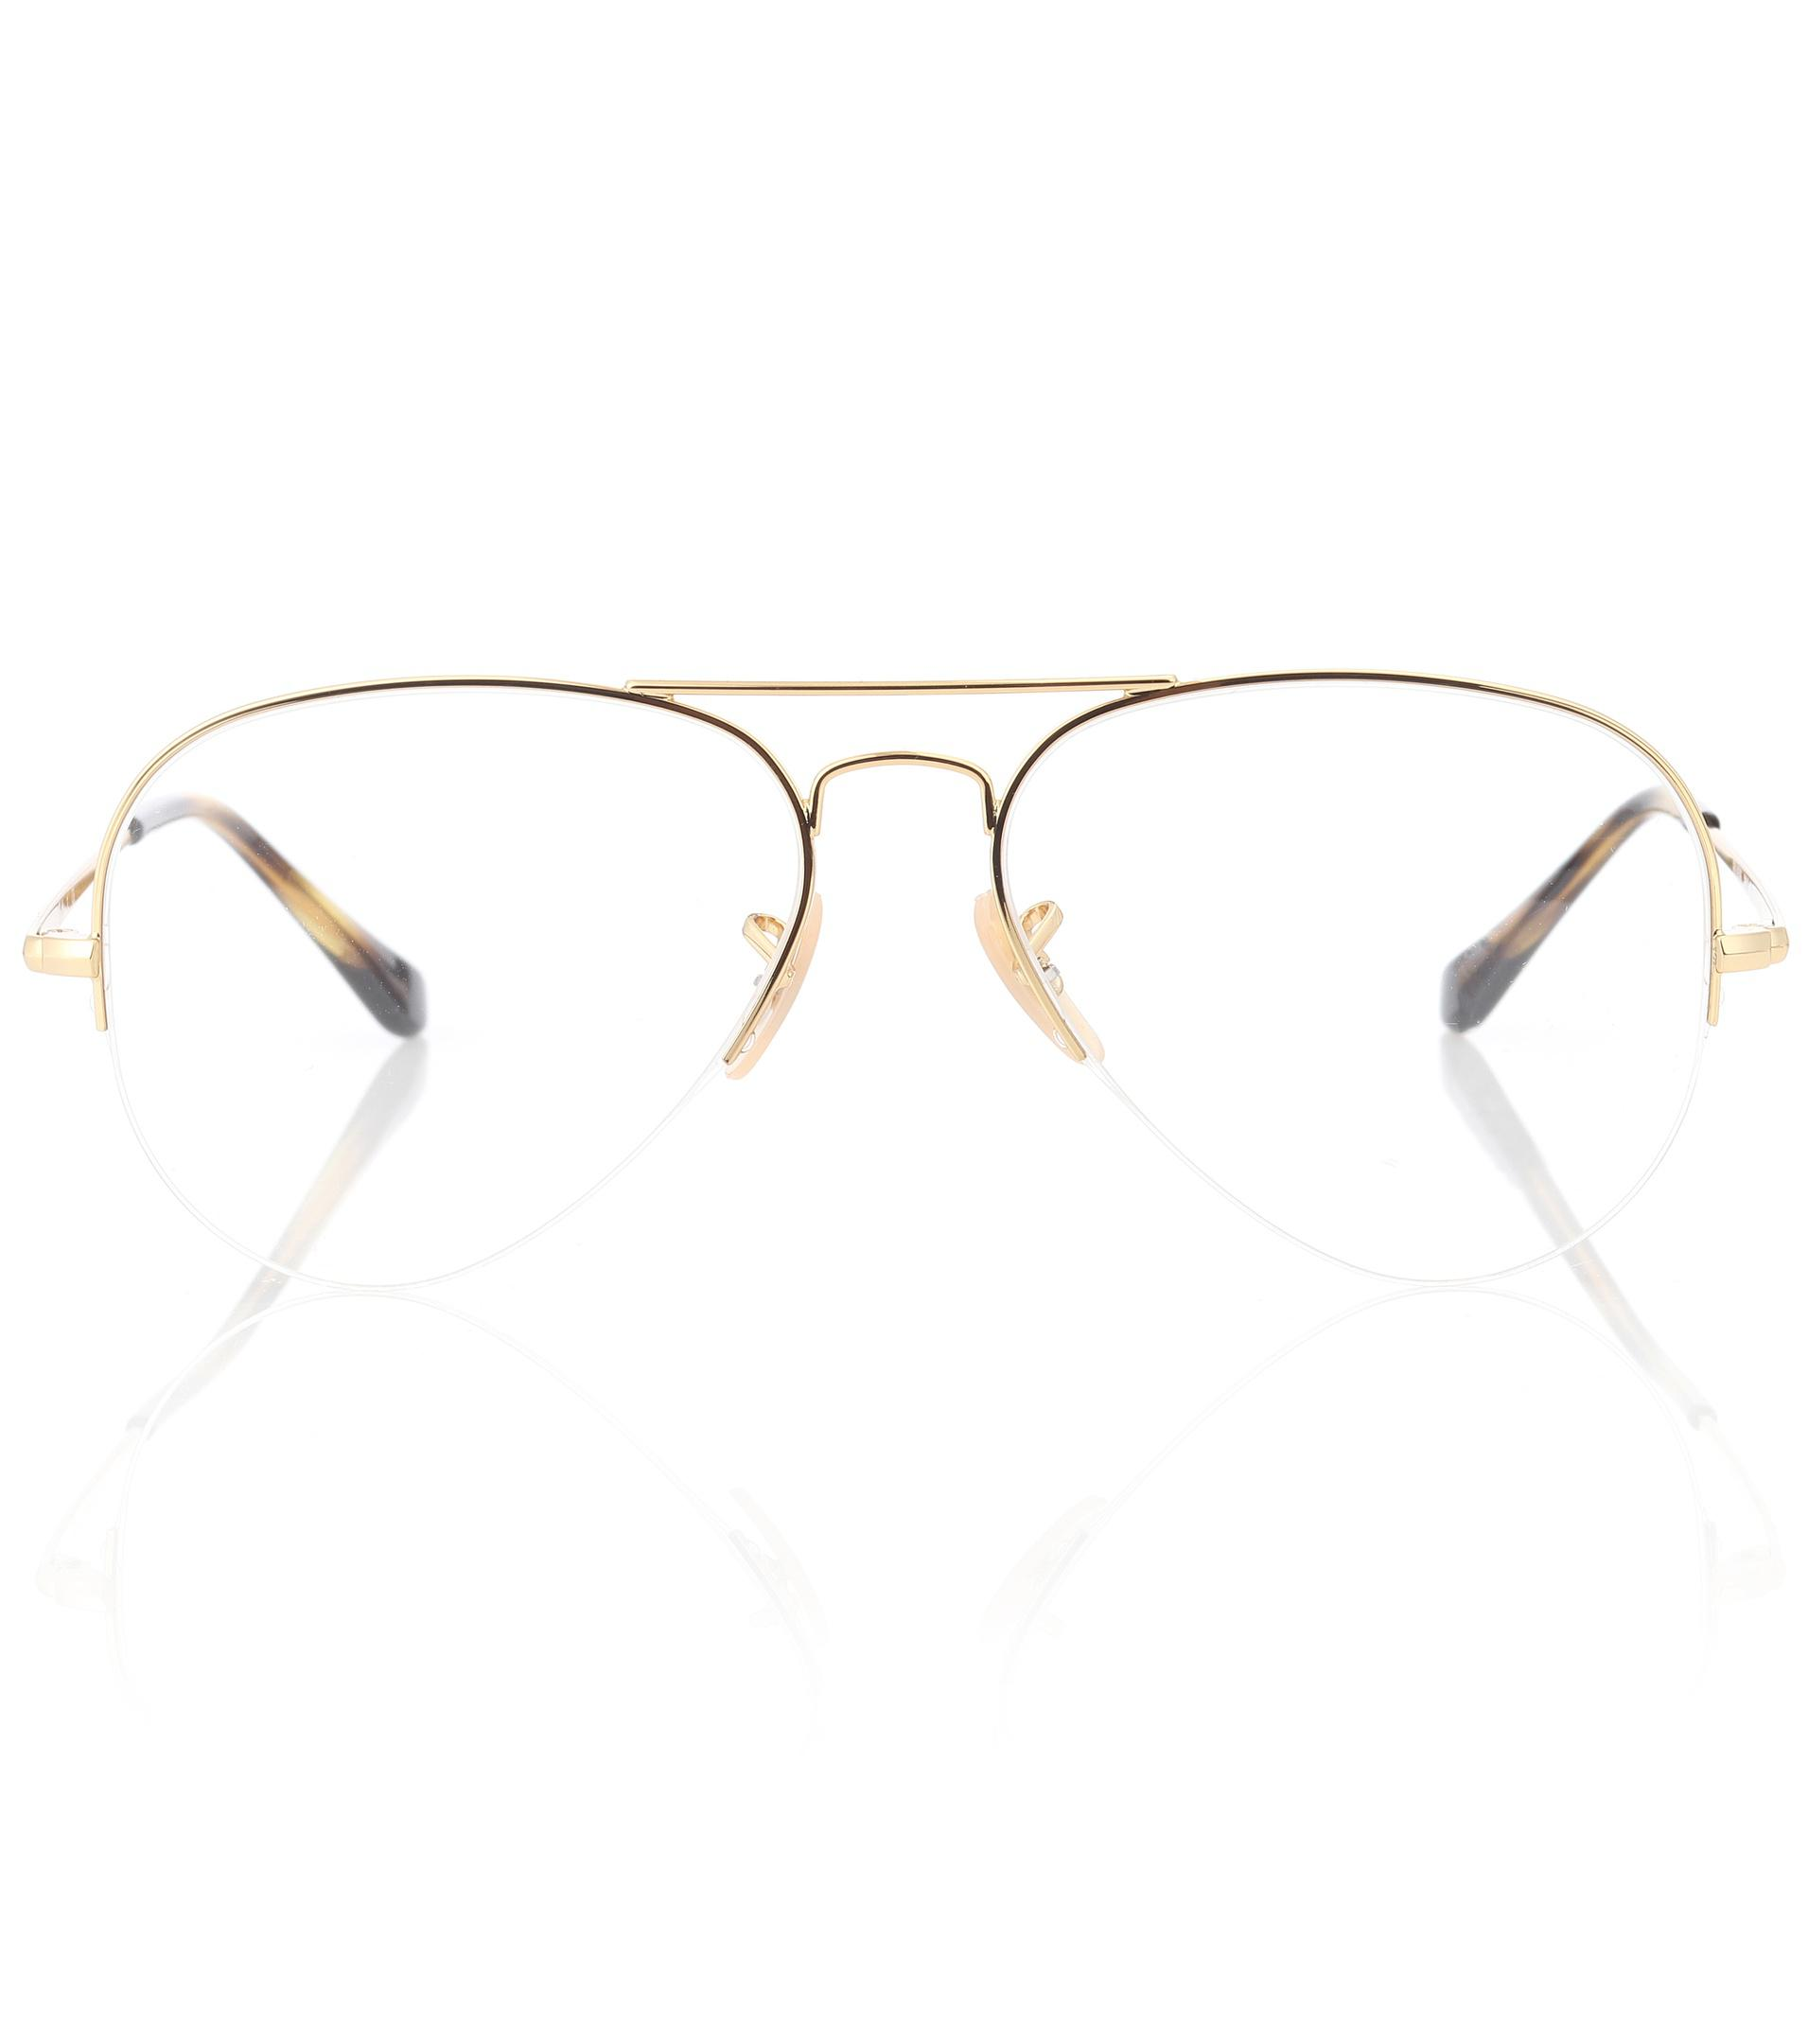 e58072679 Ray-Ban Rx6589 Aviator Gaze Glasses in Metallic - Lyst